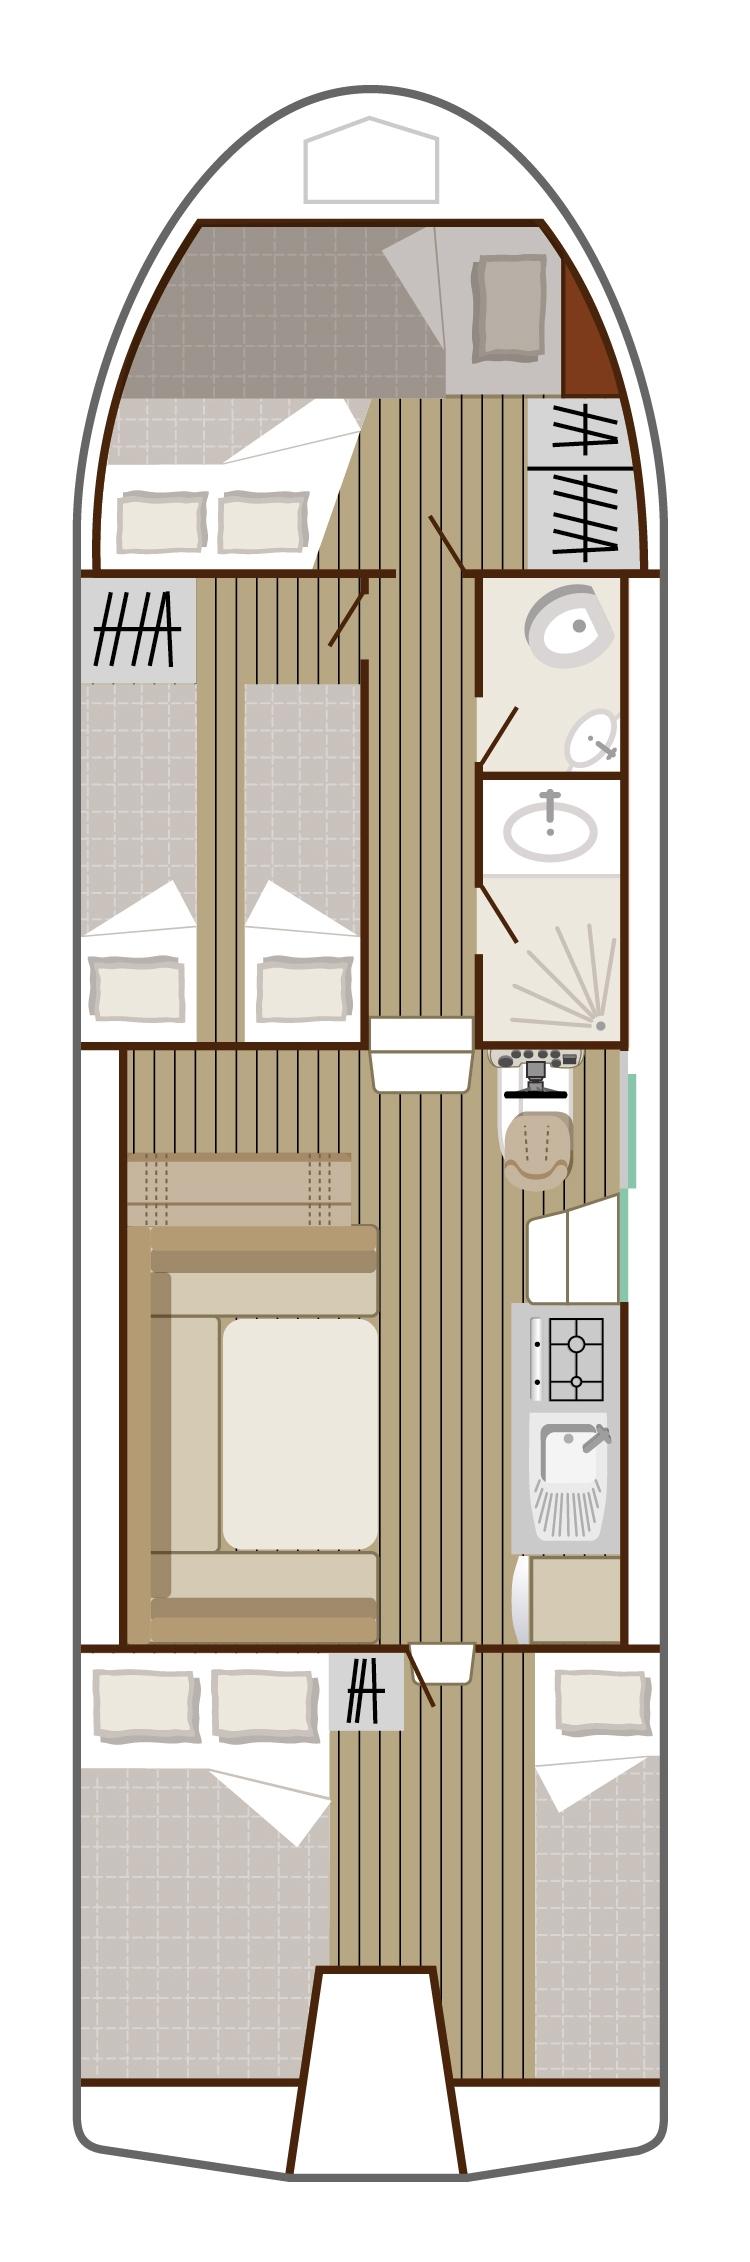 Structure Nicols Riviera 1120, intercroisieres